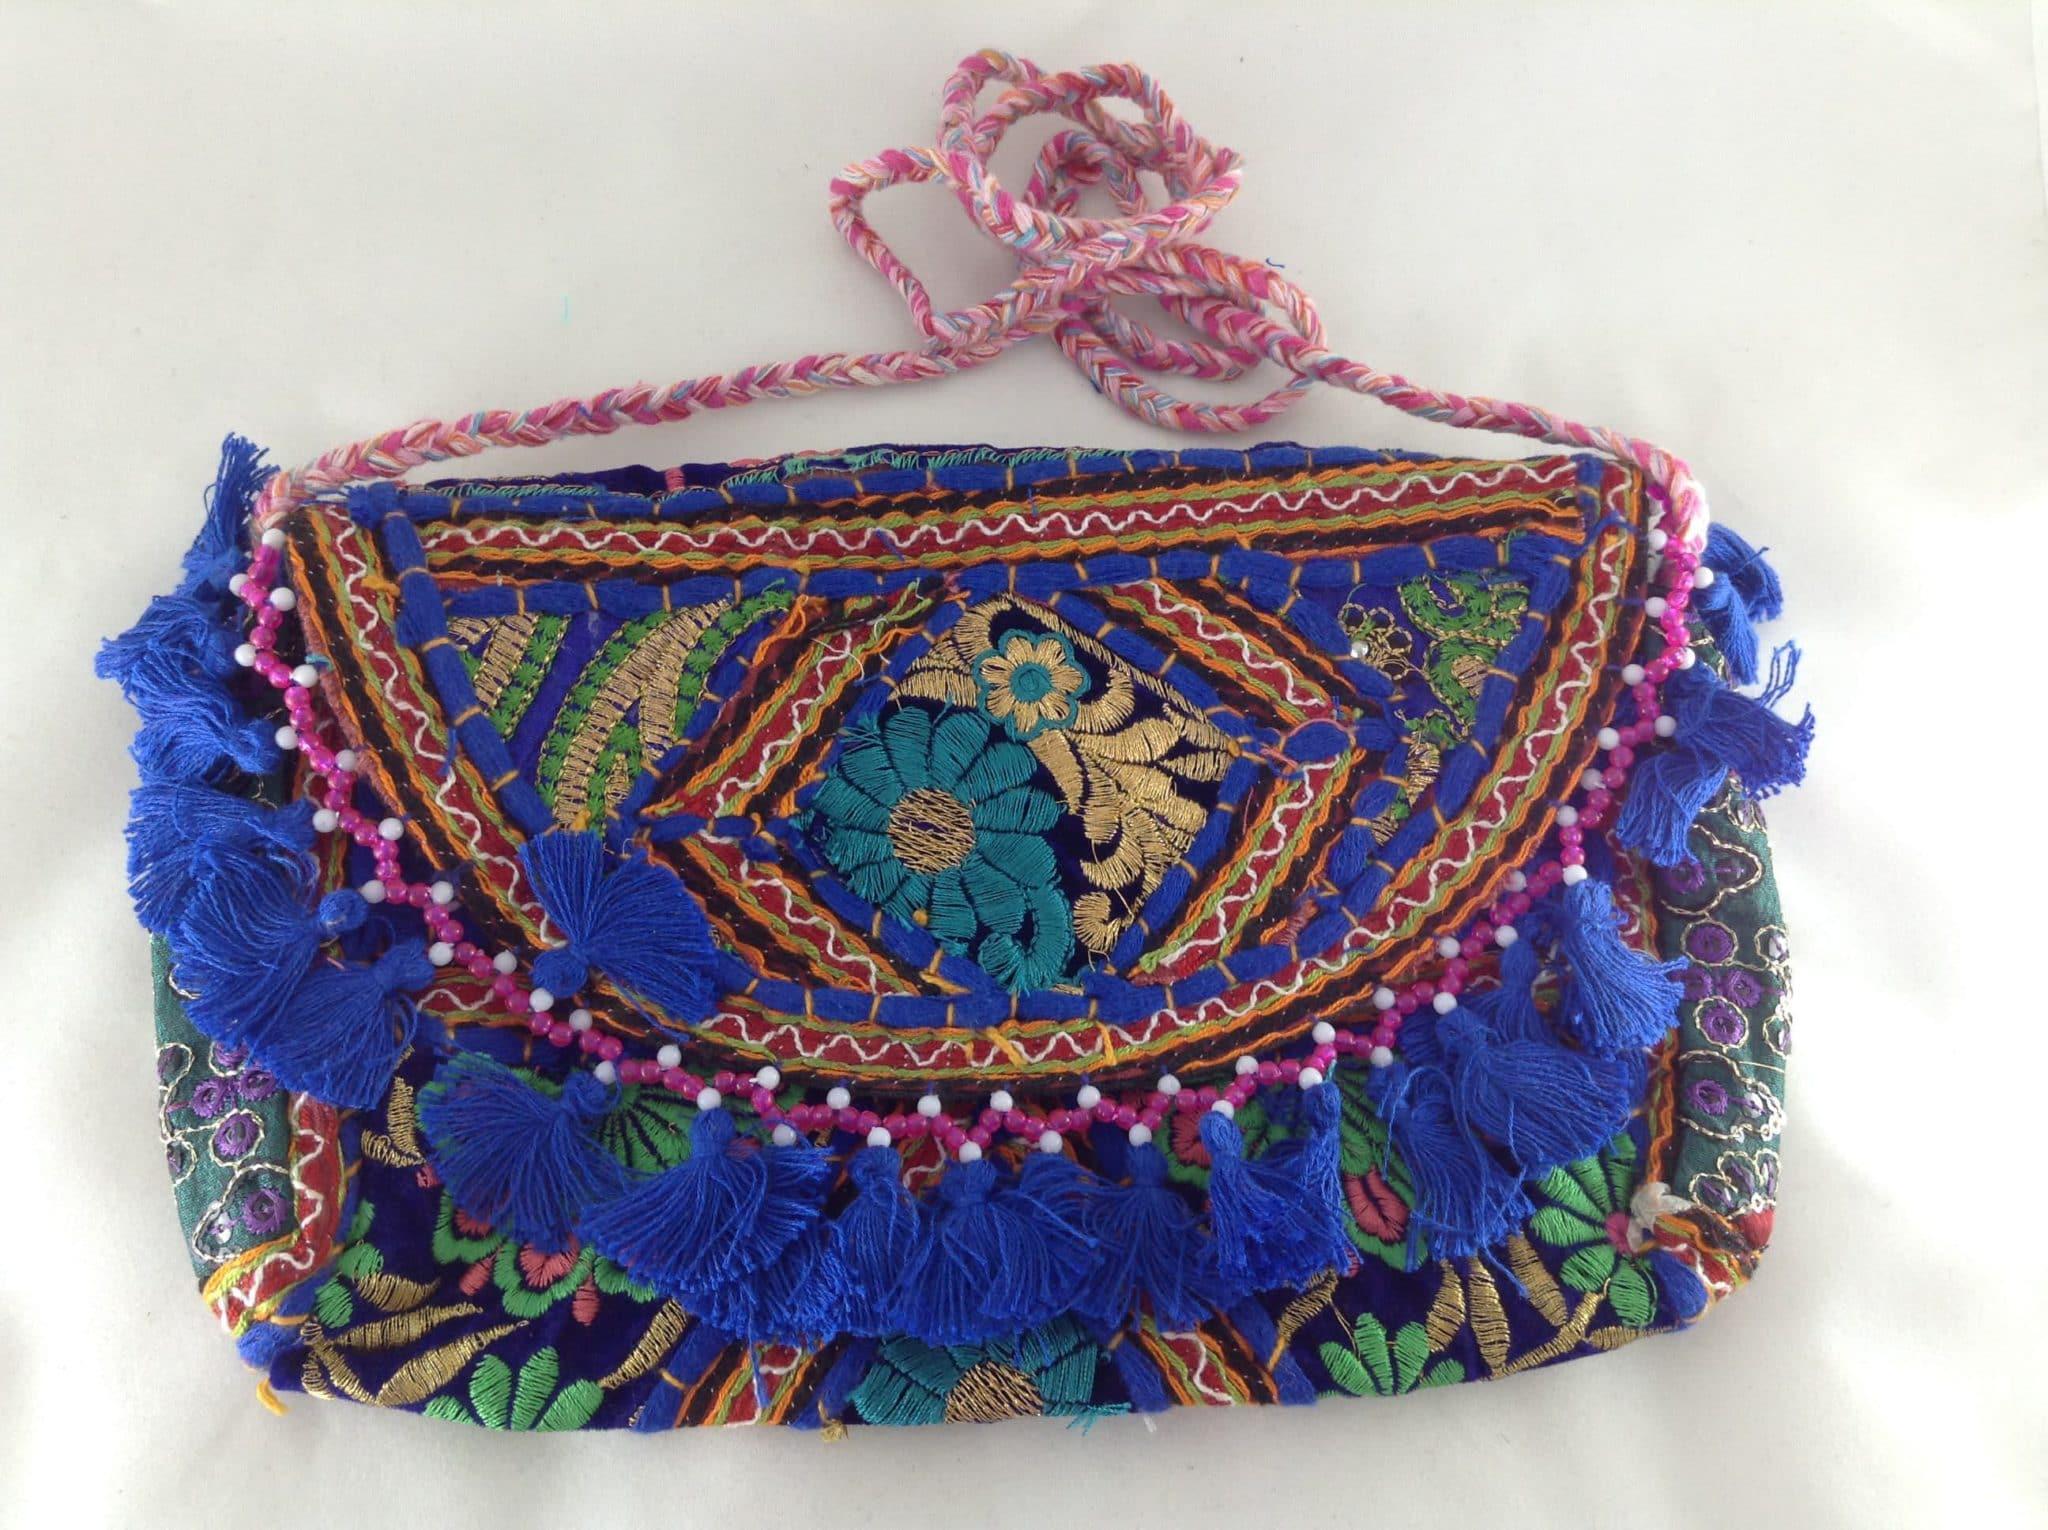 Bolsa De Mão Azul Royal : Bolsa indiana banjara bordada a m?o azul royal